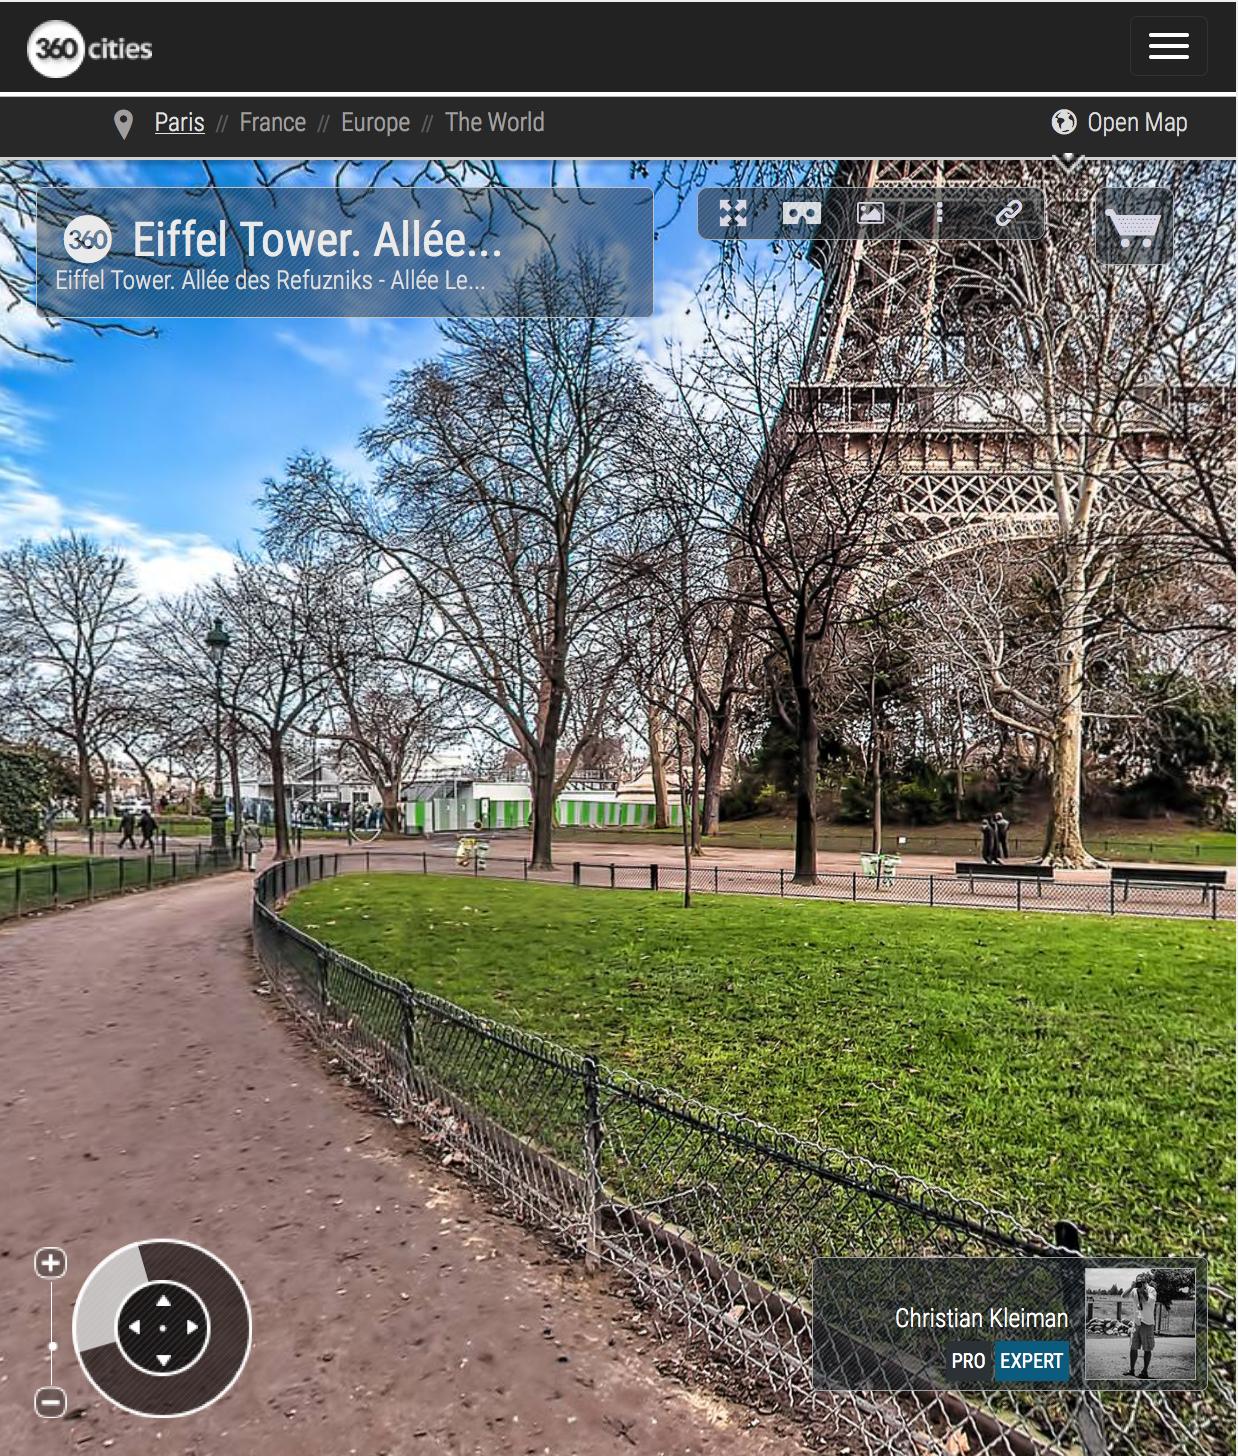 Eiffel Tower. Allée des Refuzniks - Allée Leon Bourgeois - Creative 360 VR Spherical Panoramic Photography - Emblematic Paris by © Christian Kleiman